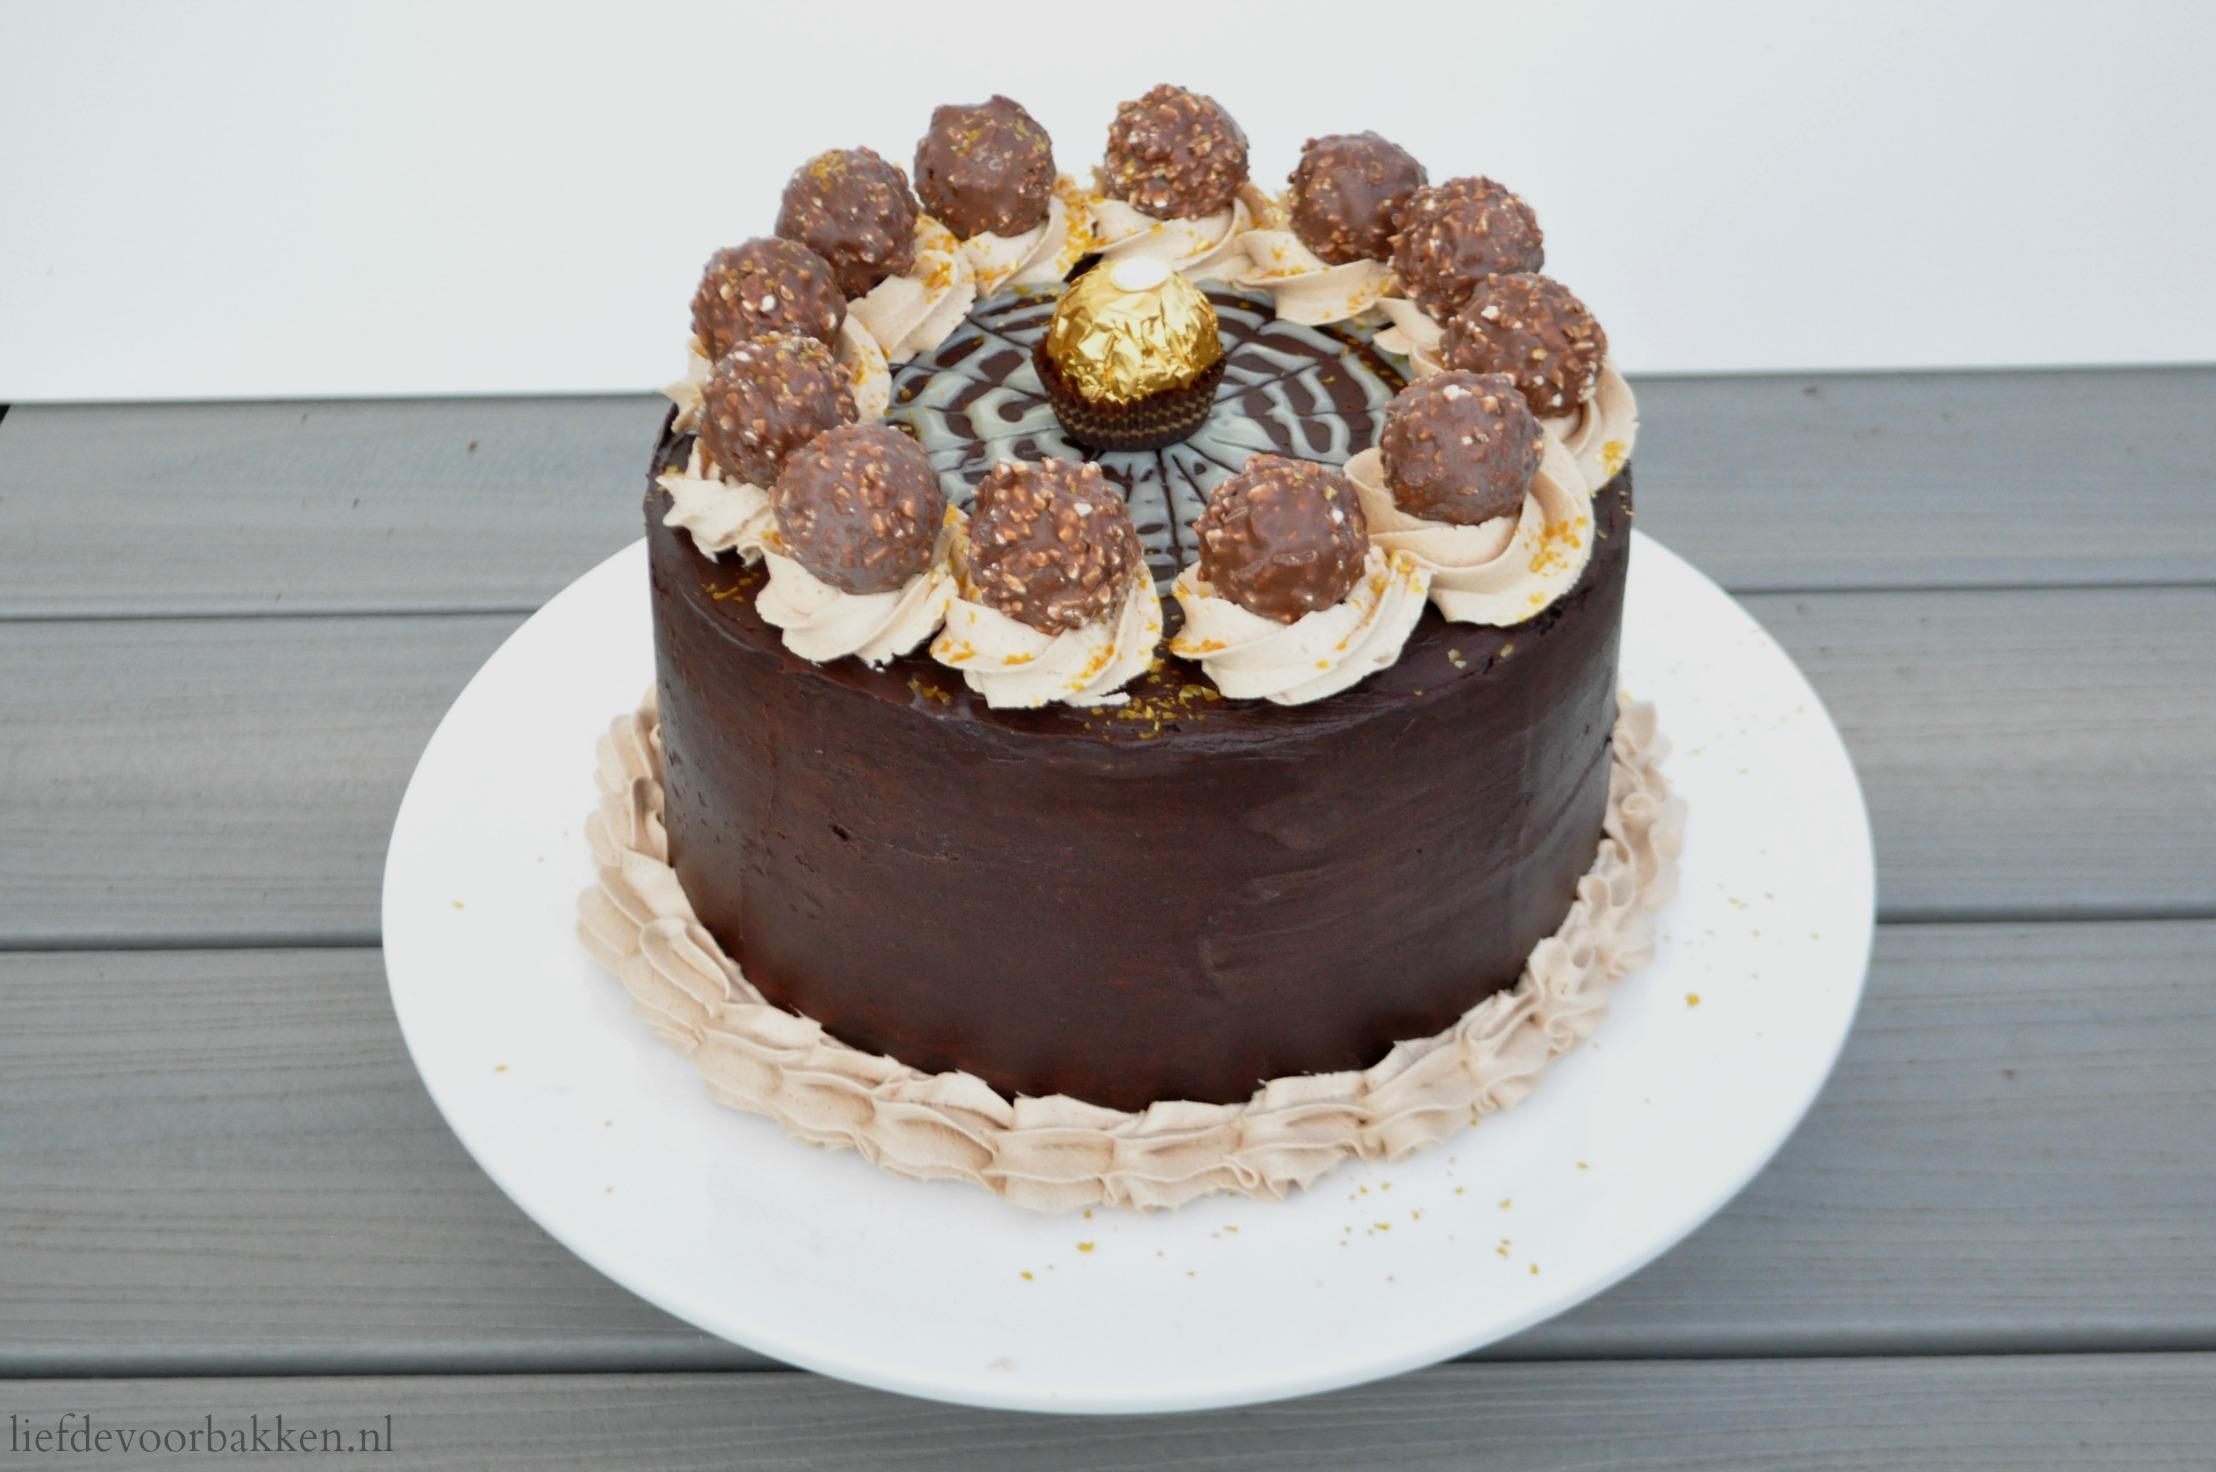 ferrero rocher taart Ferrero rocher taart – Liefde voor bakken ferrero rocher taart